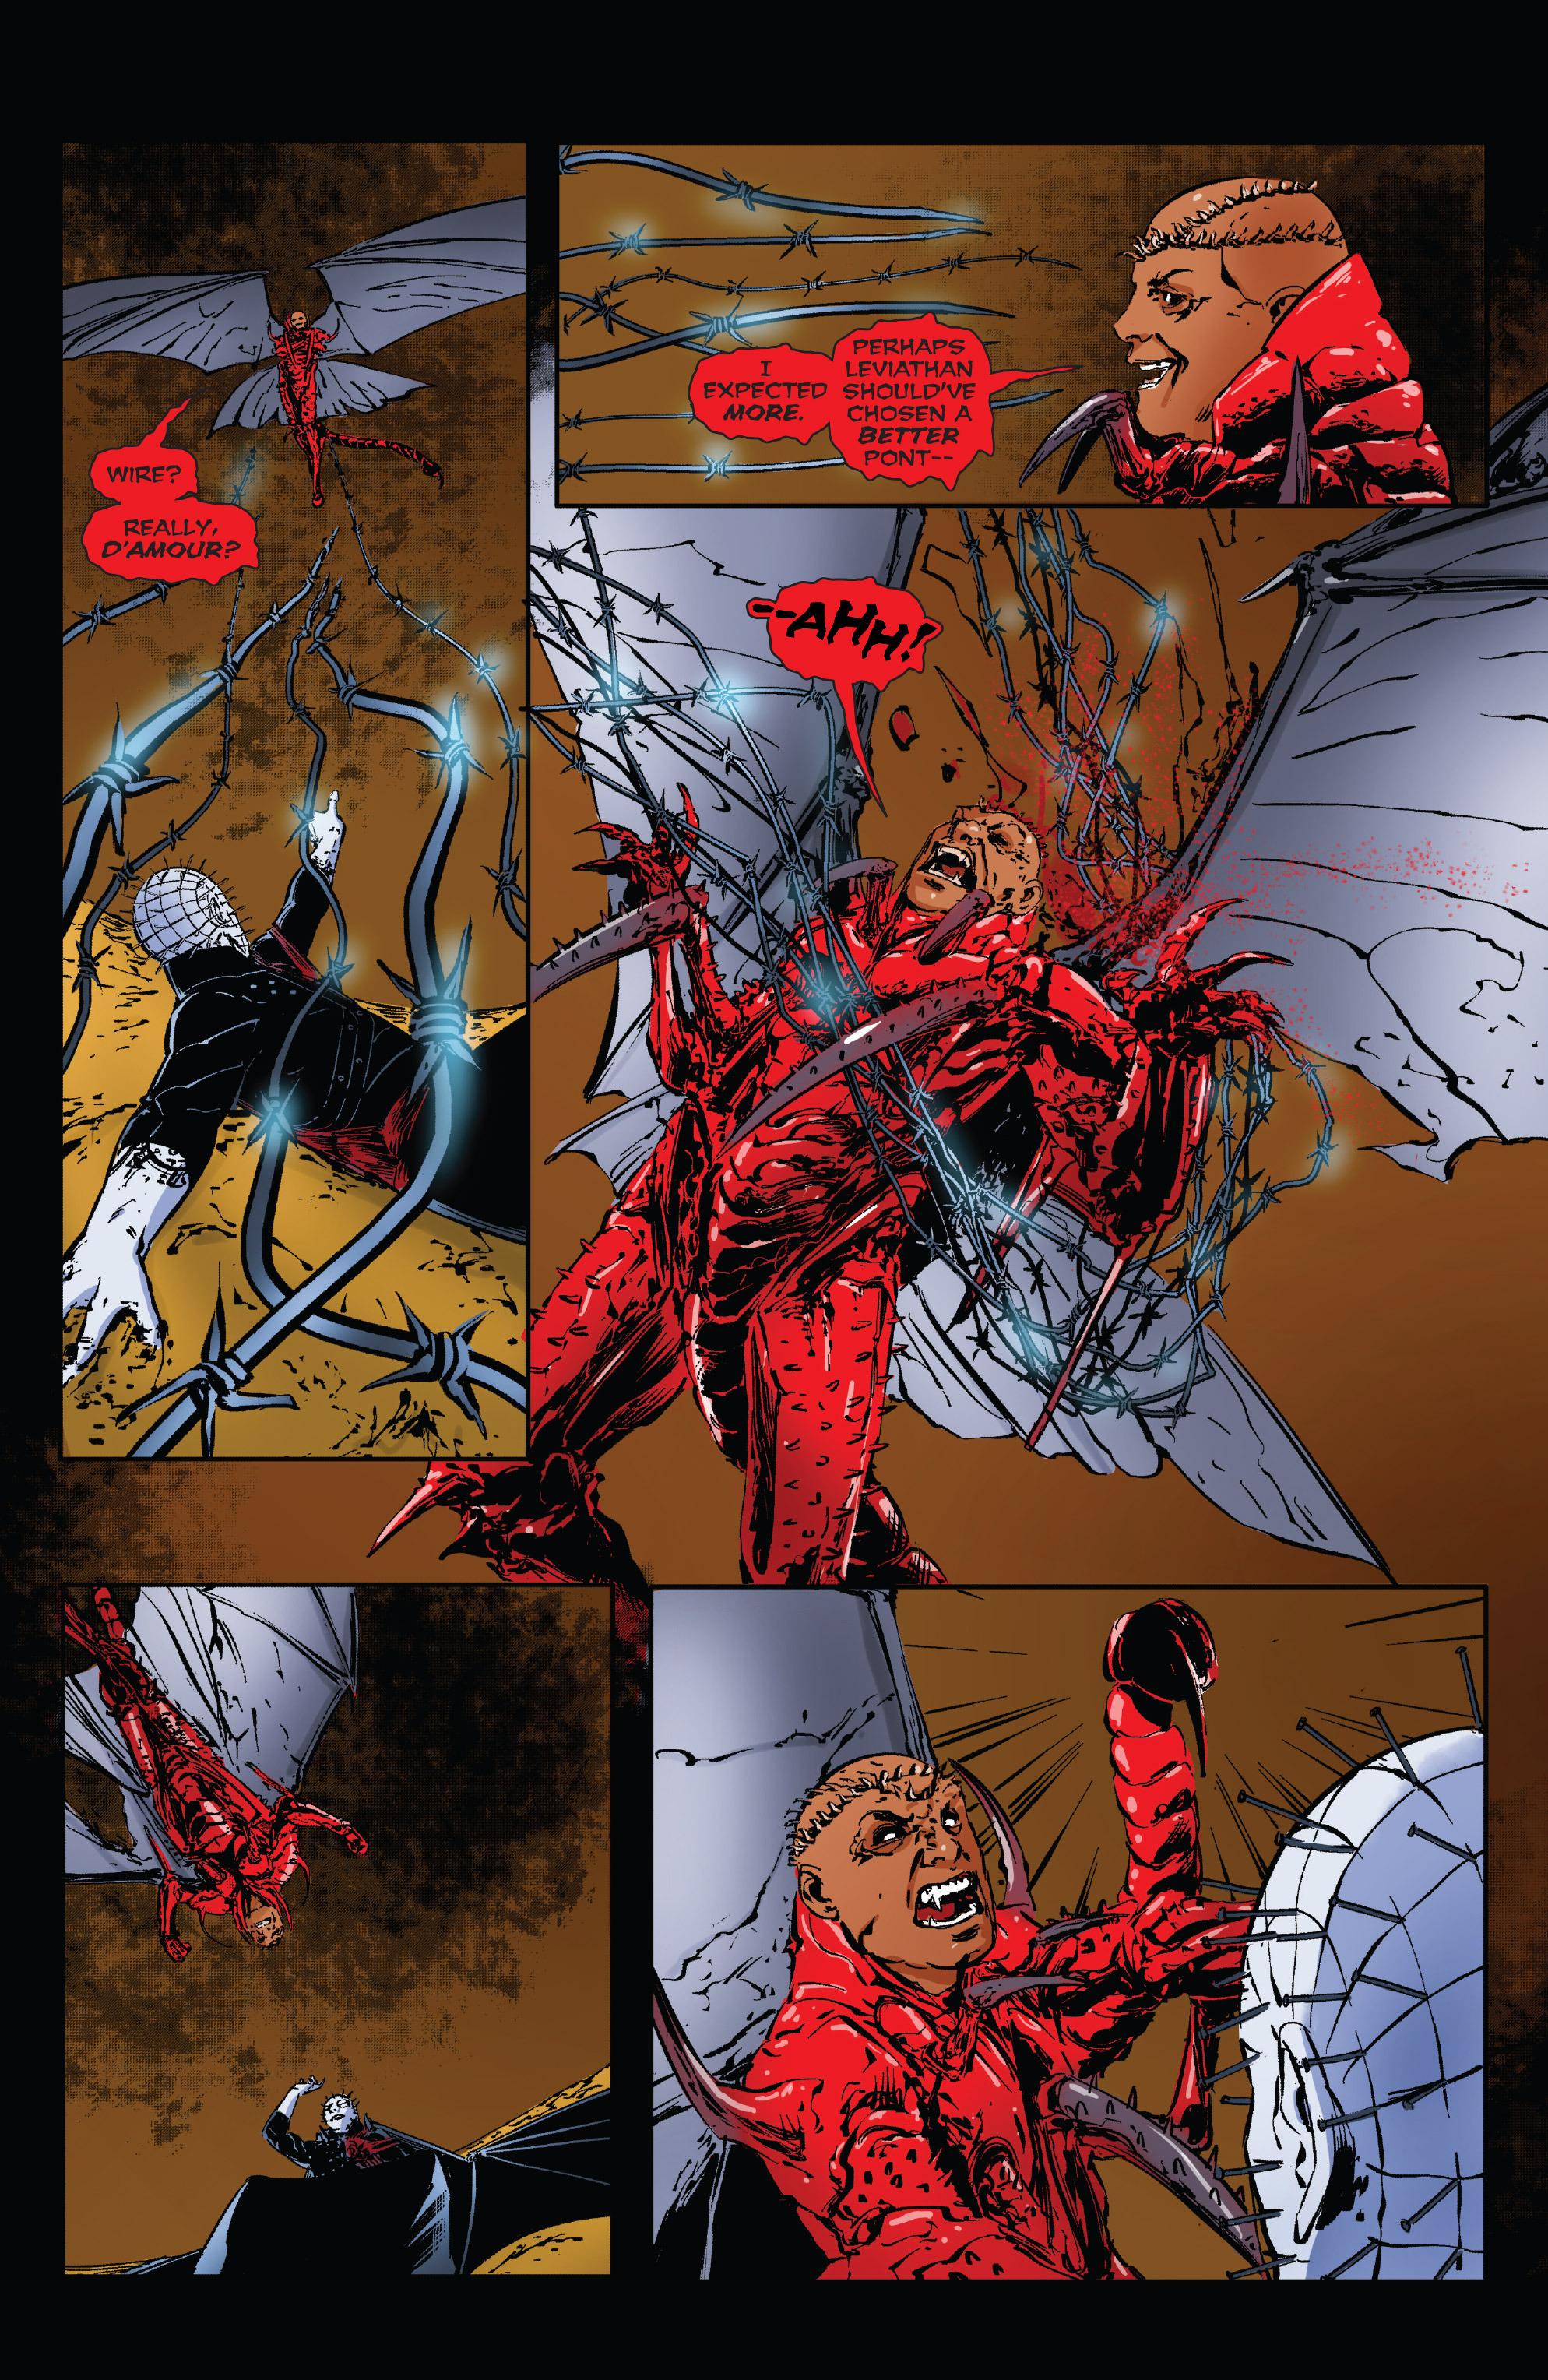 Read online Clive Barker's Hellraiser: The Dark Watch comic -  Issue # TPB 3 - 74